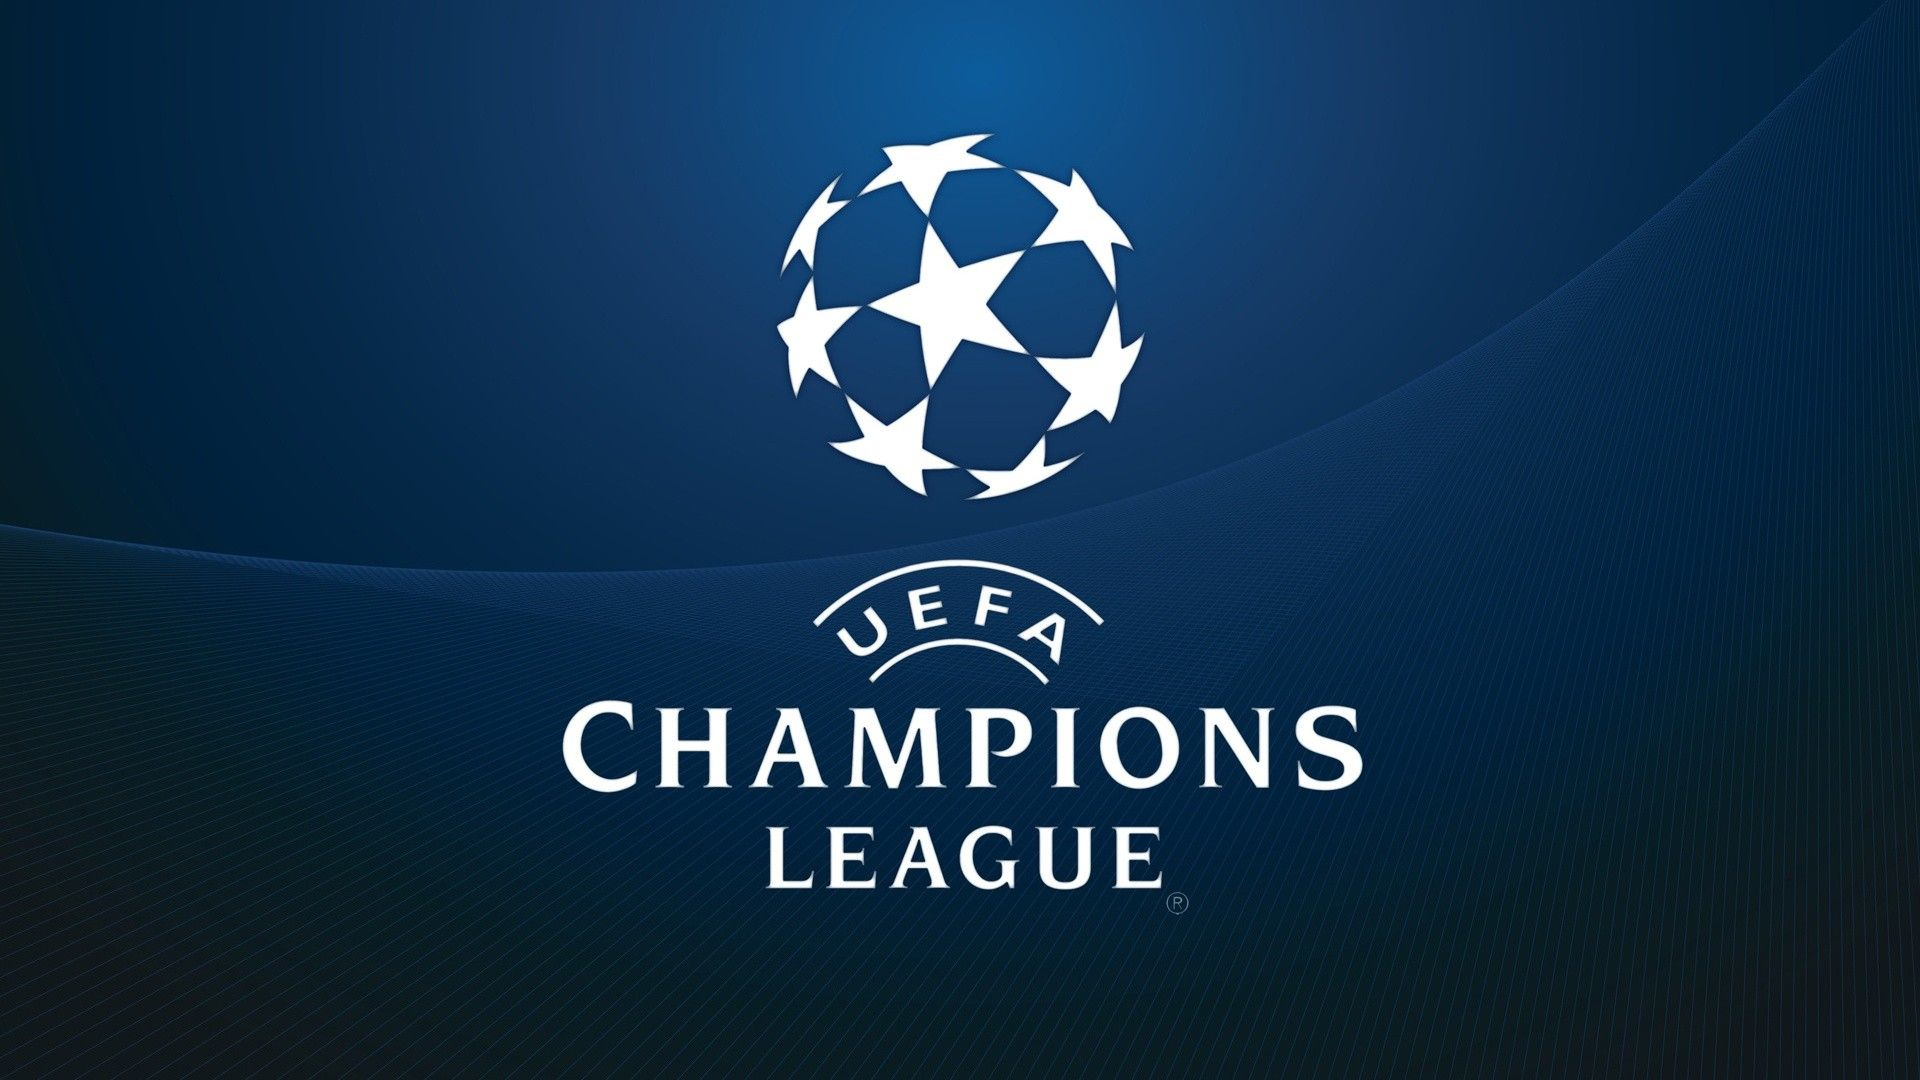 UEFA Champions League Logo HD Wallpaper | places you